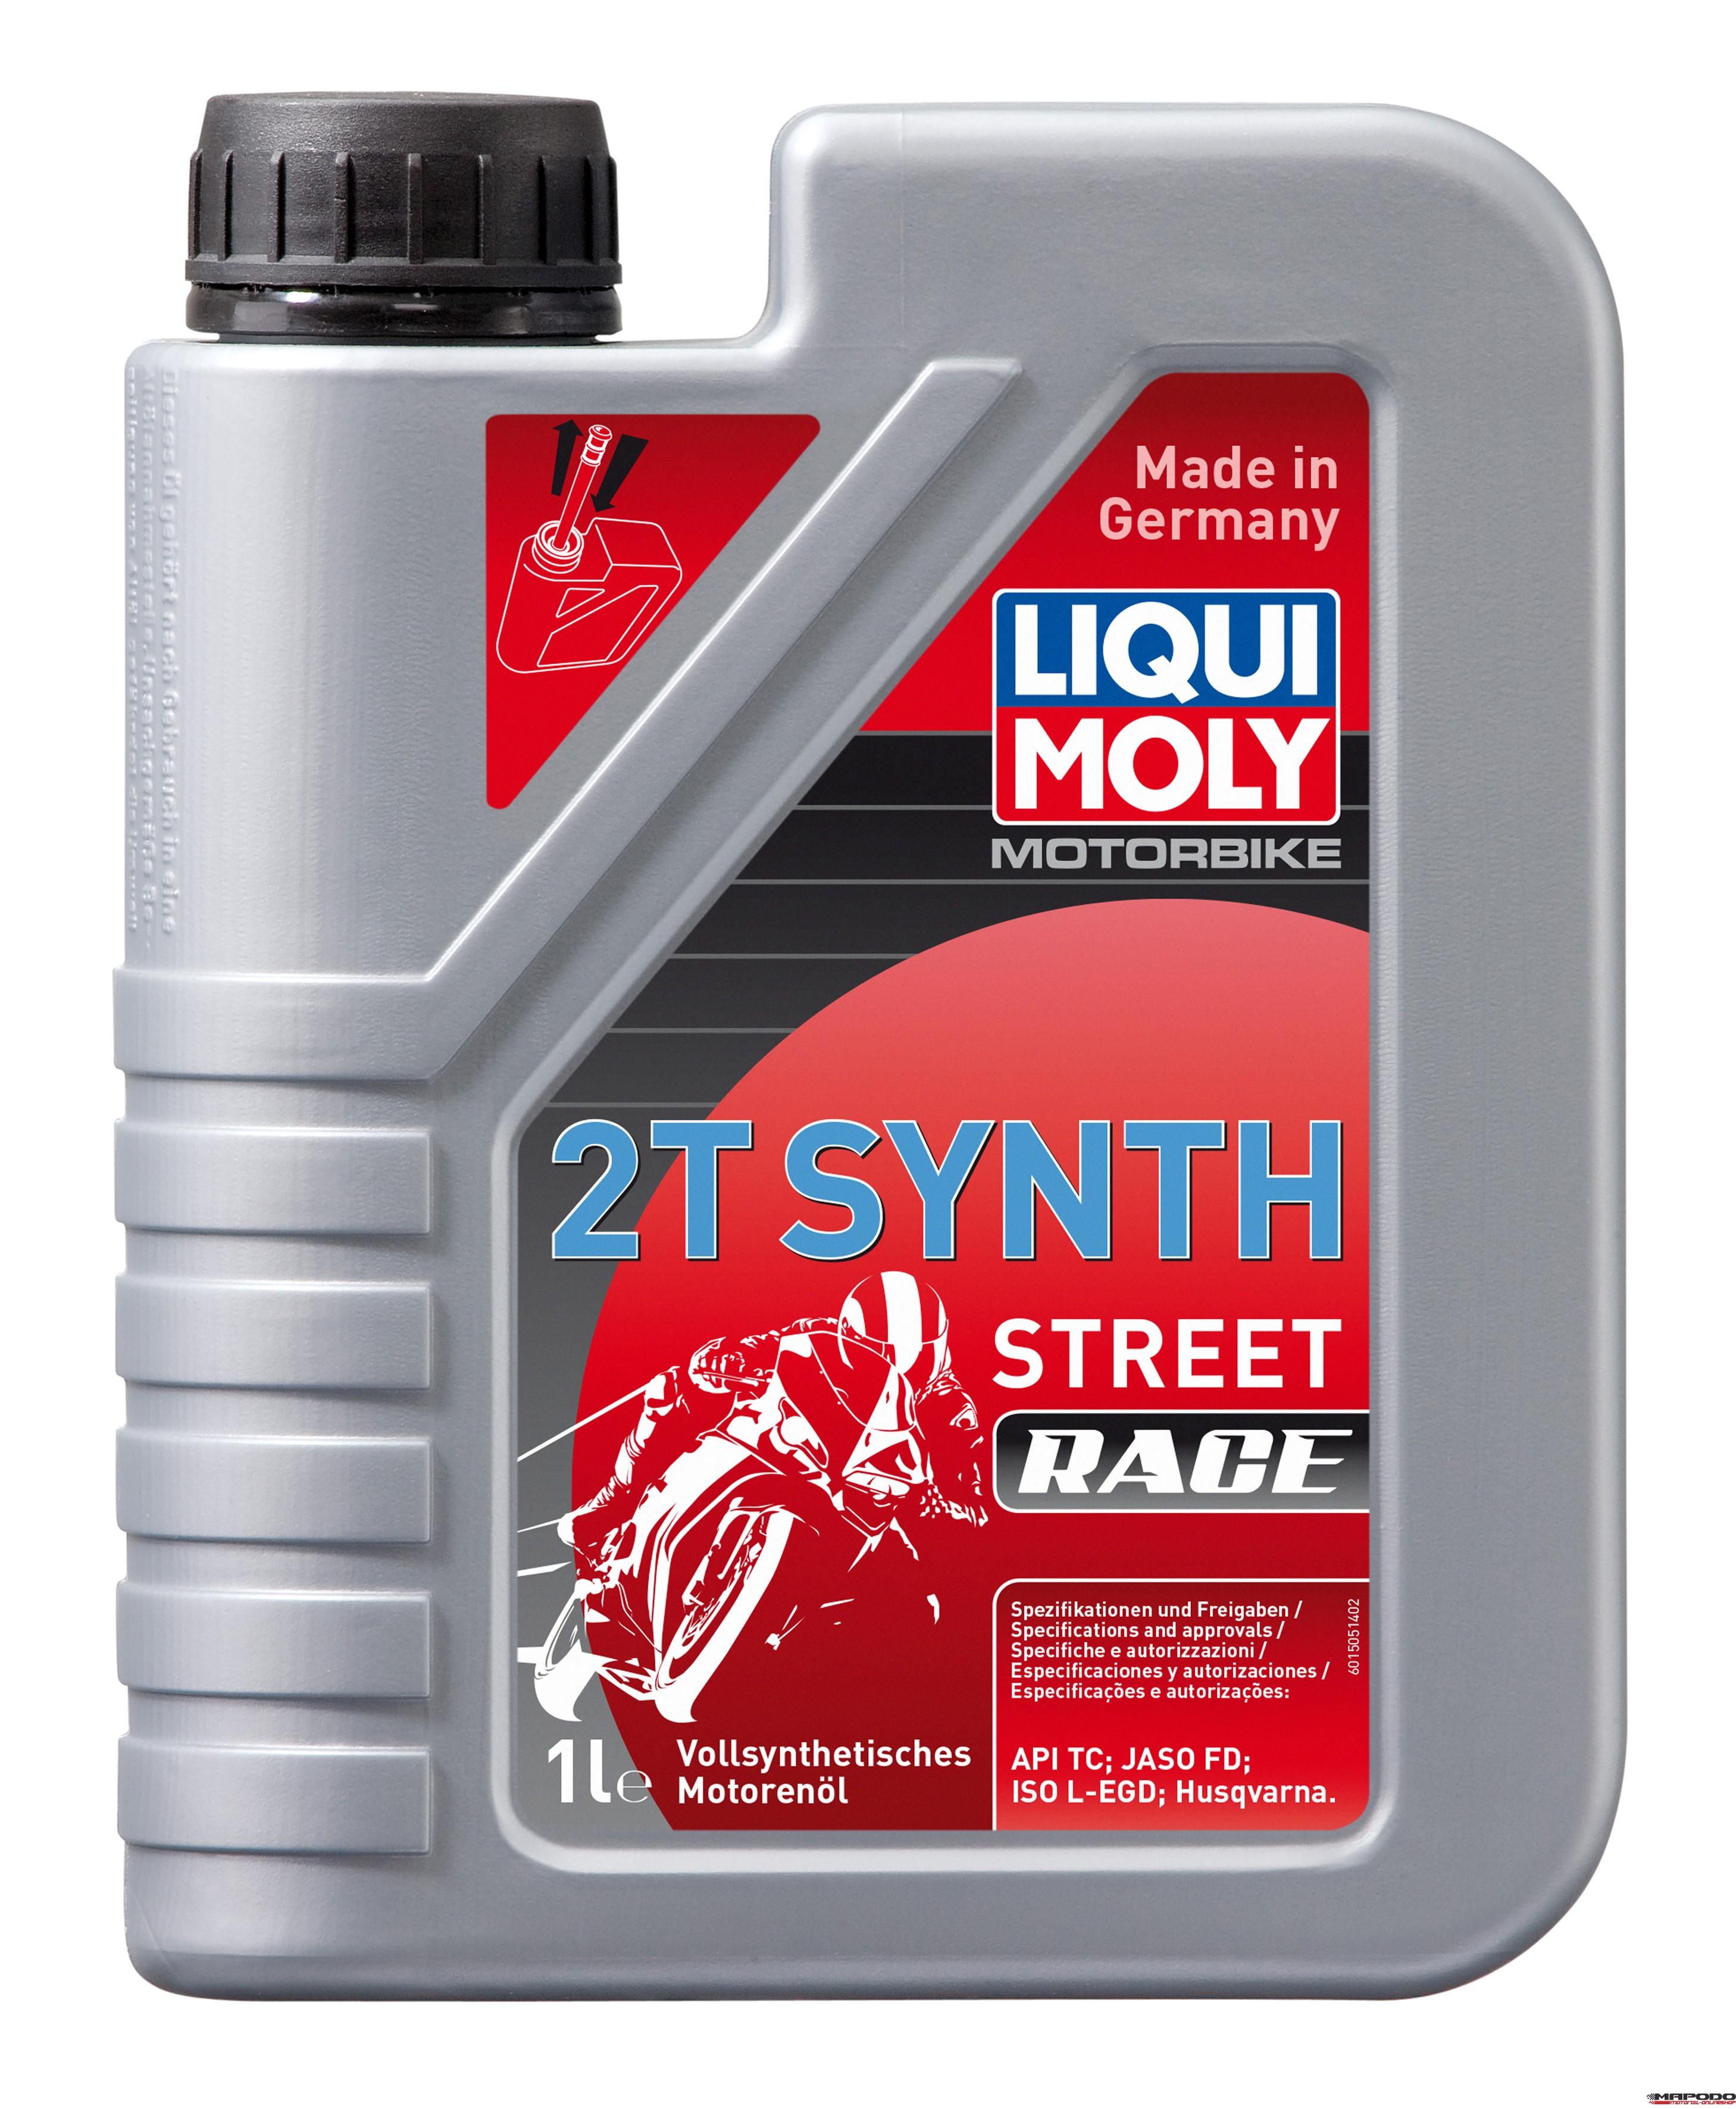 Liqui Moly 1505 Motorbike 2T Synth Street Race 1L